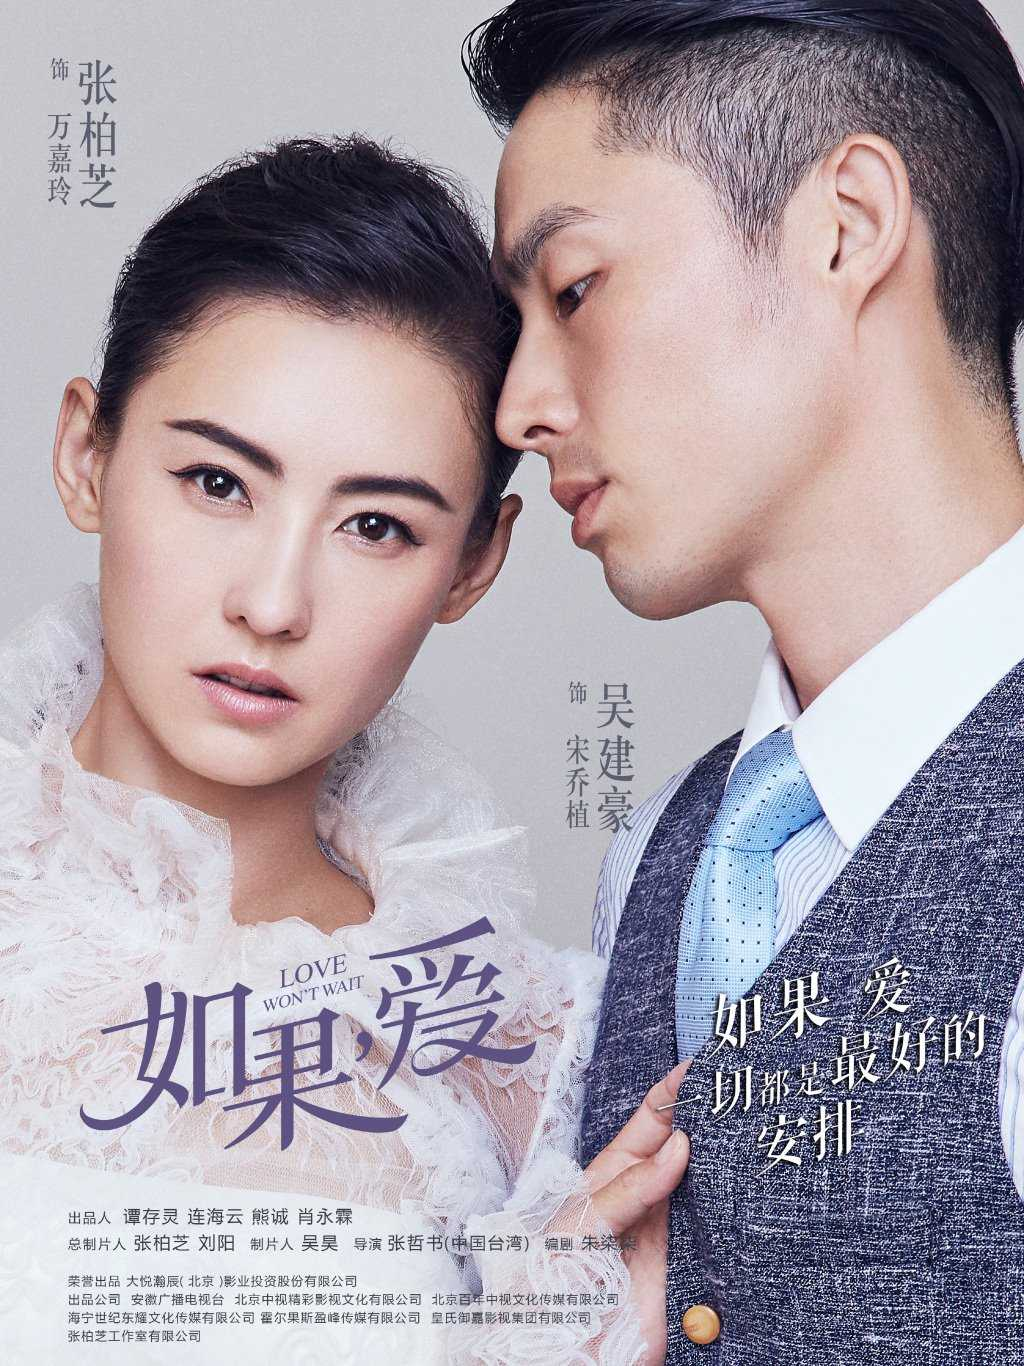 love-won-t-wait-เพียงใจไม่อาจรอรัก-2018-ตอนที่-1-50-พากย์ไทย-จบ-